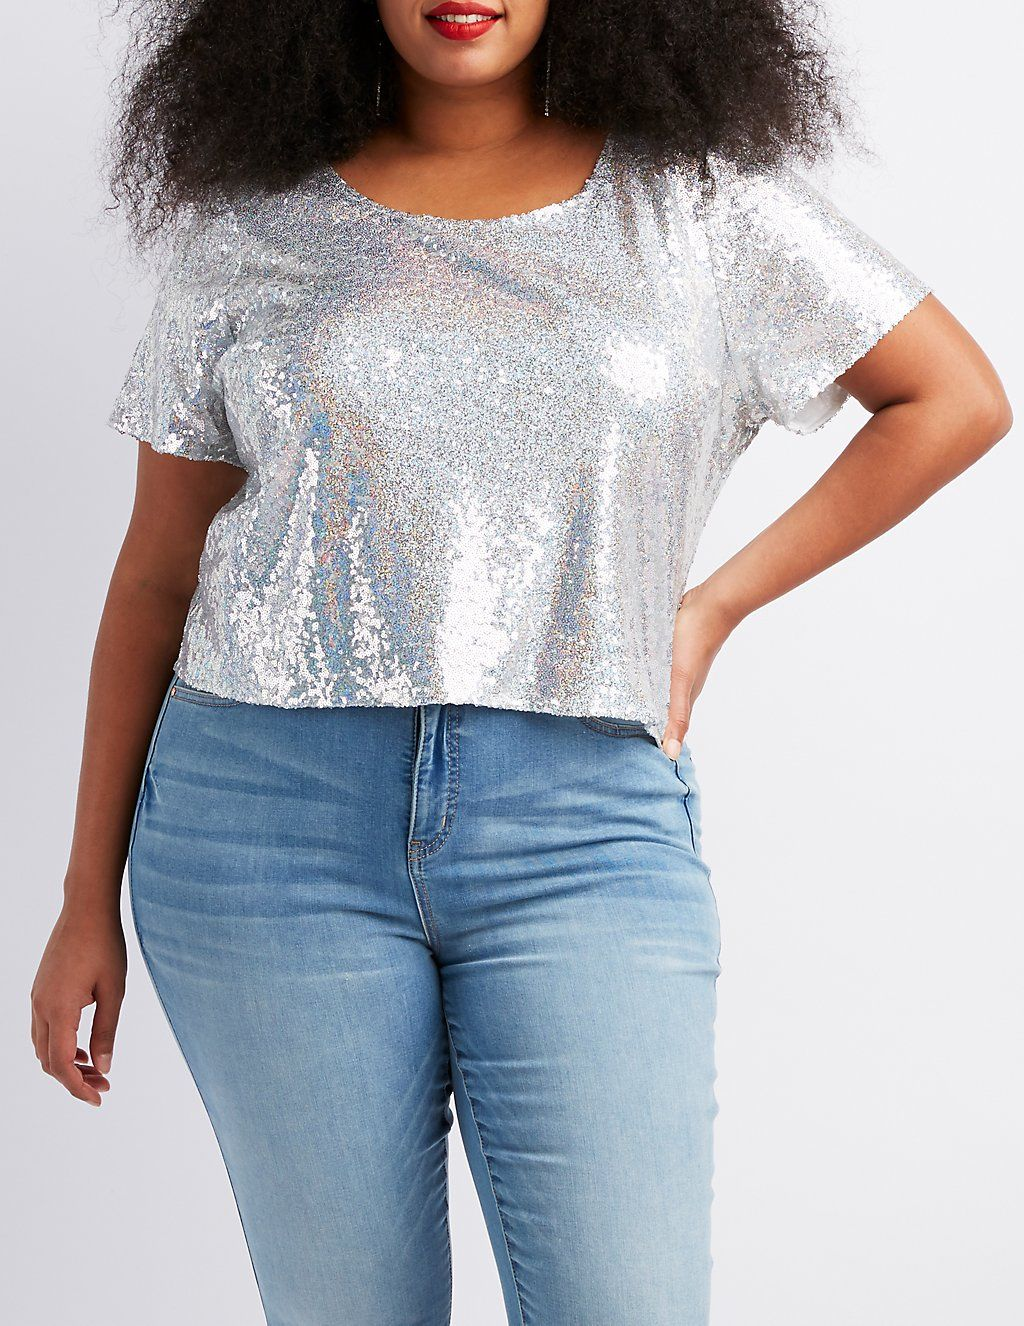 Plus Size Sequins Open Back Crop Top Tops Lace Tops Crop Tops